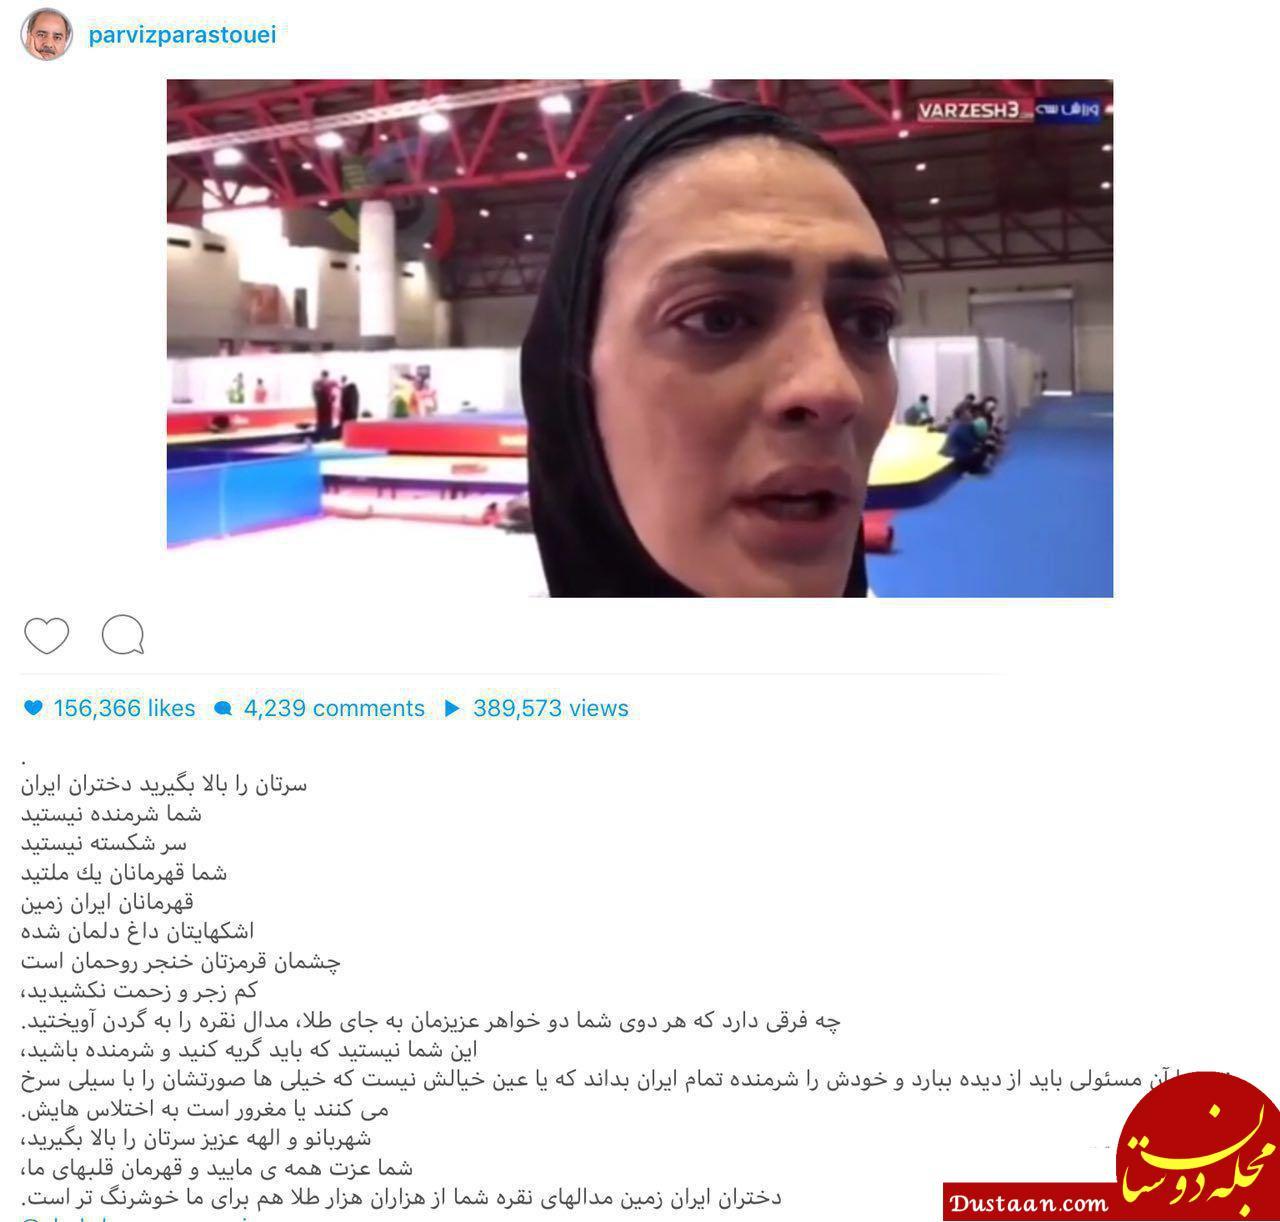 www.dustaan.com پست اینستاگرامی پرویز پرستویی برای خواهران منصوریان